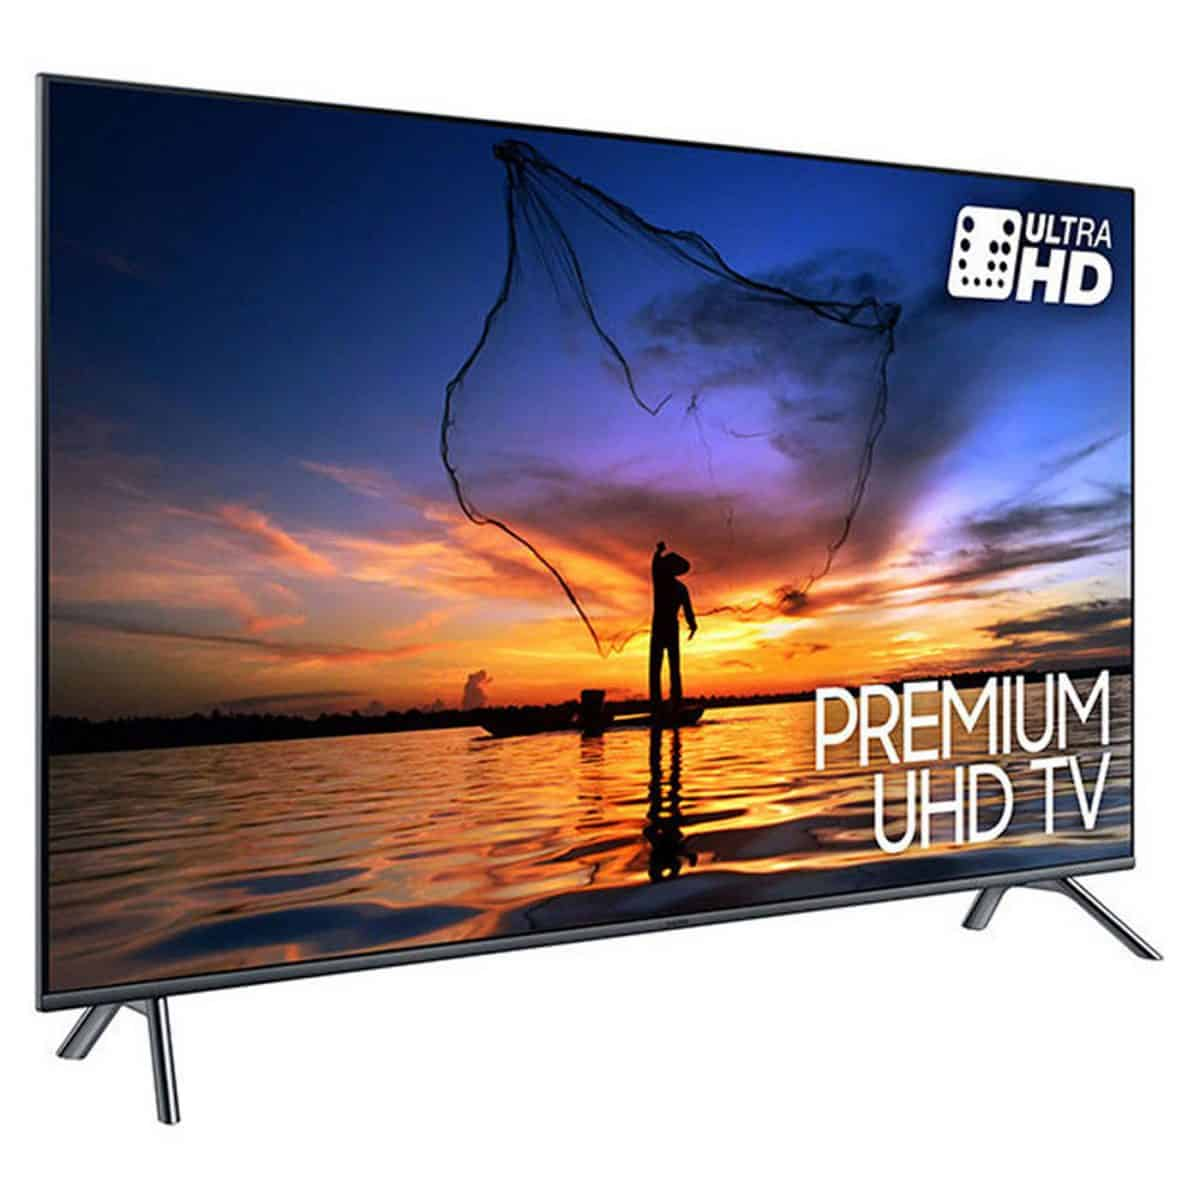 5caba34bd24 Samsung UE55MU7040 - 55 inch - 4K Ultra HD - HDR - Smart TV ...